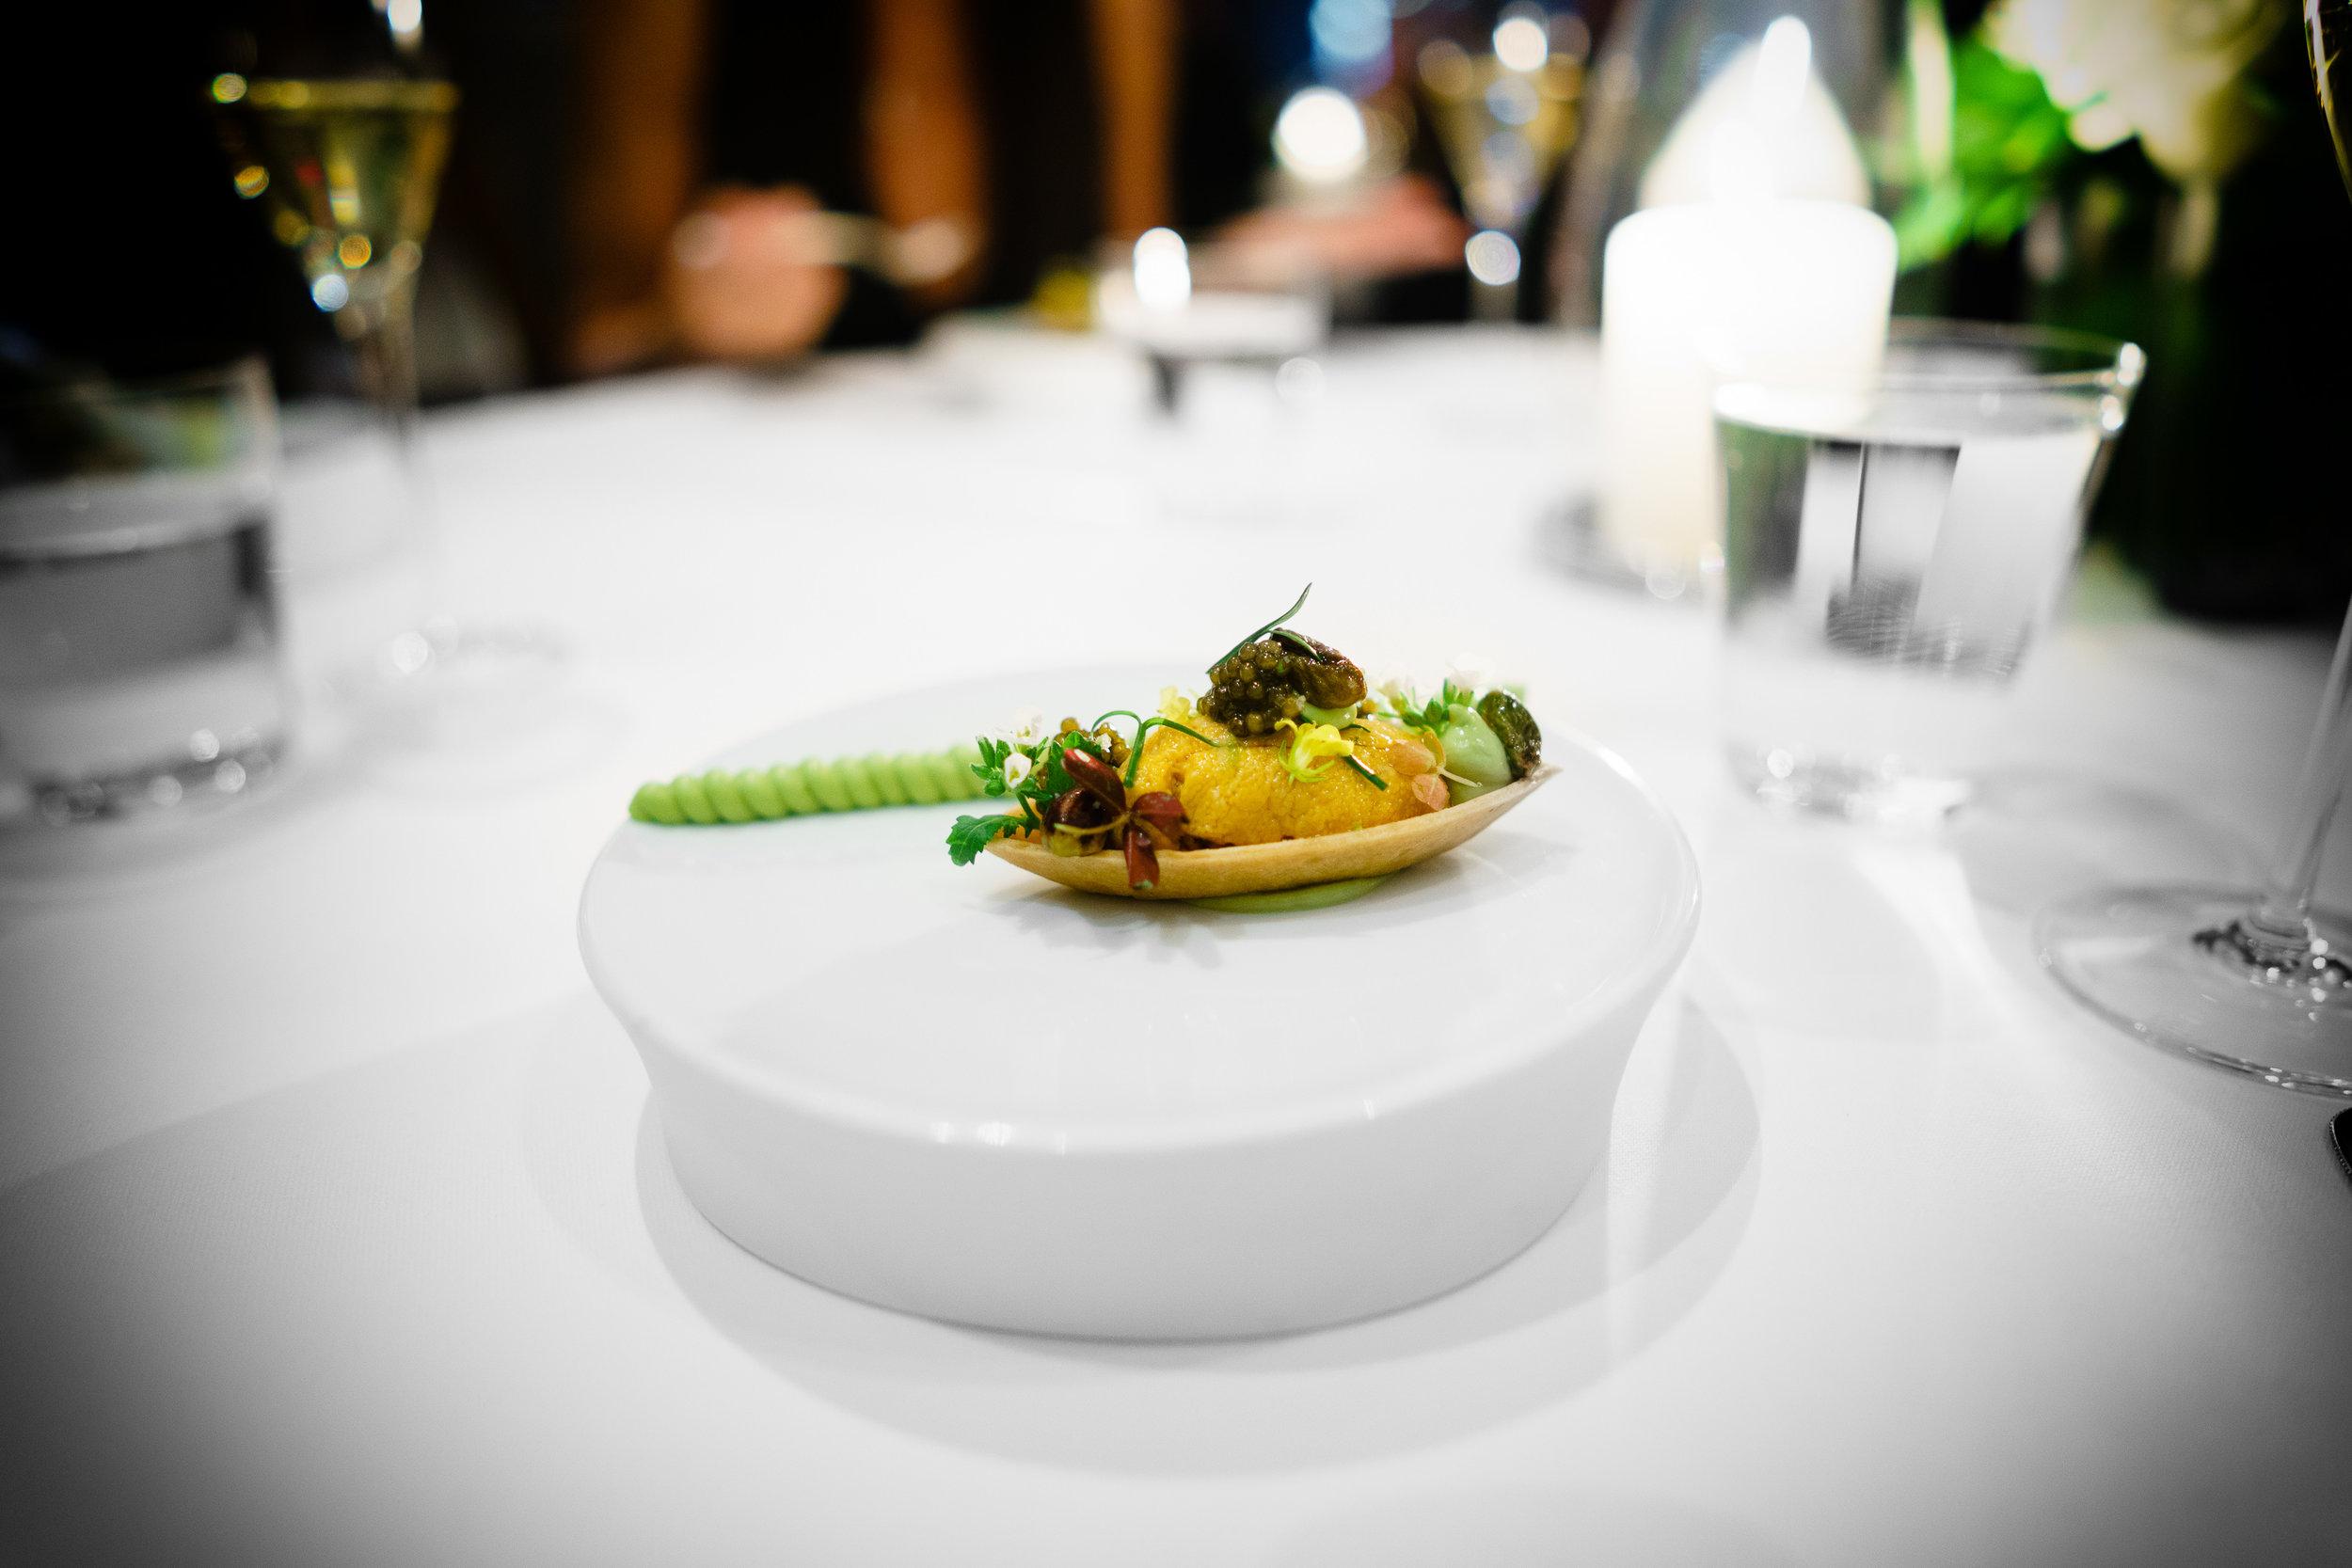 "Santa Barbara Sea Urchin ""Barquette"" - Royal Kaluga Caviar and Hass Avocado Mousse"